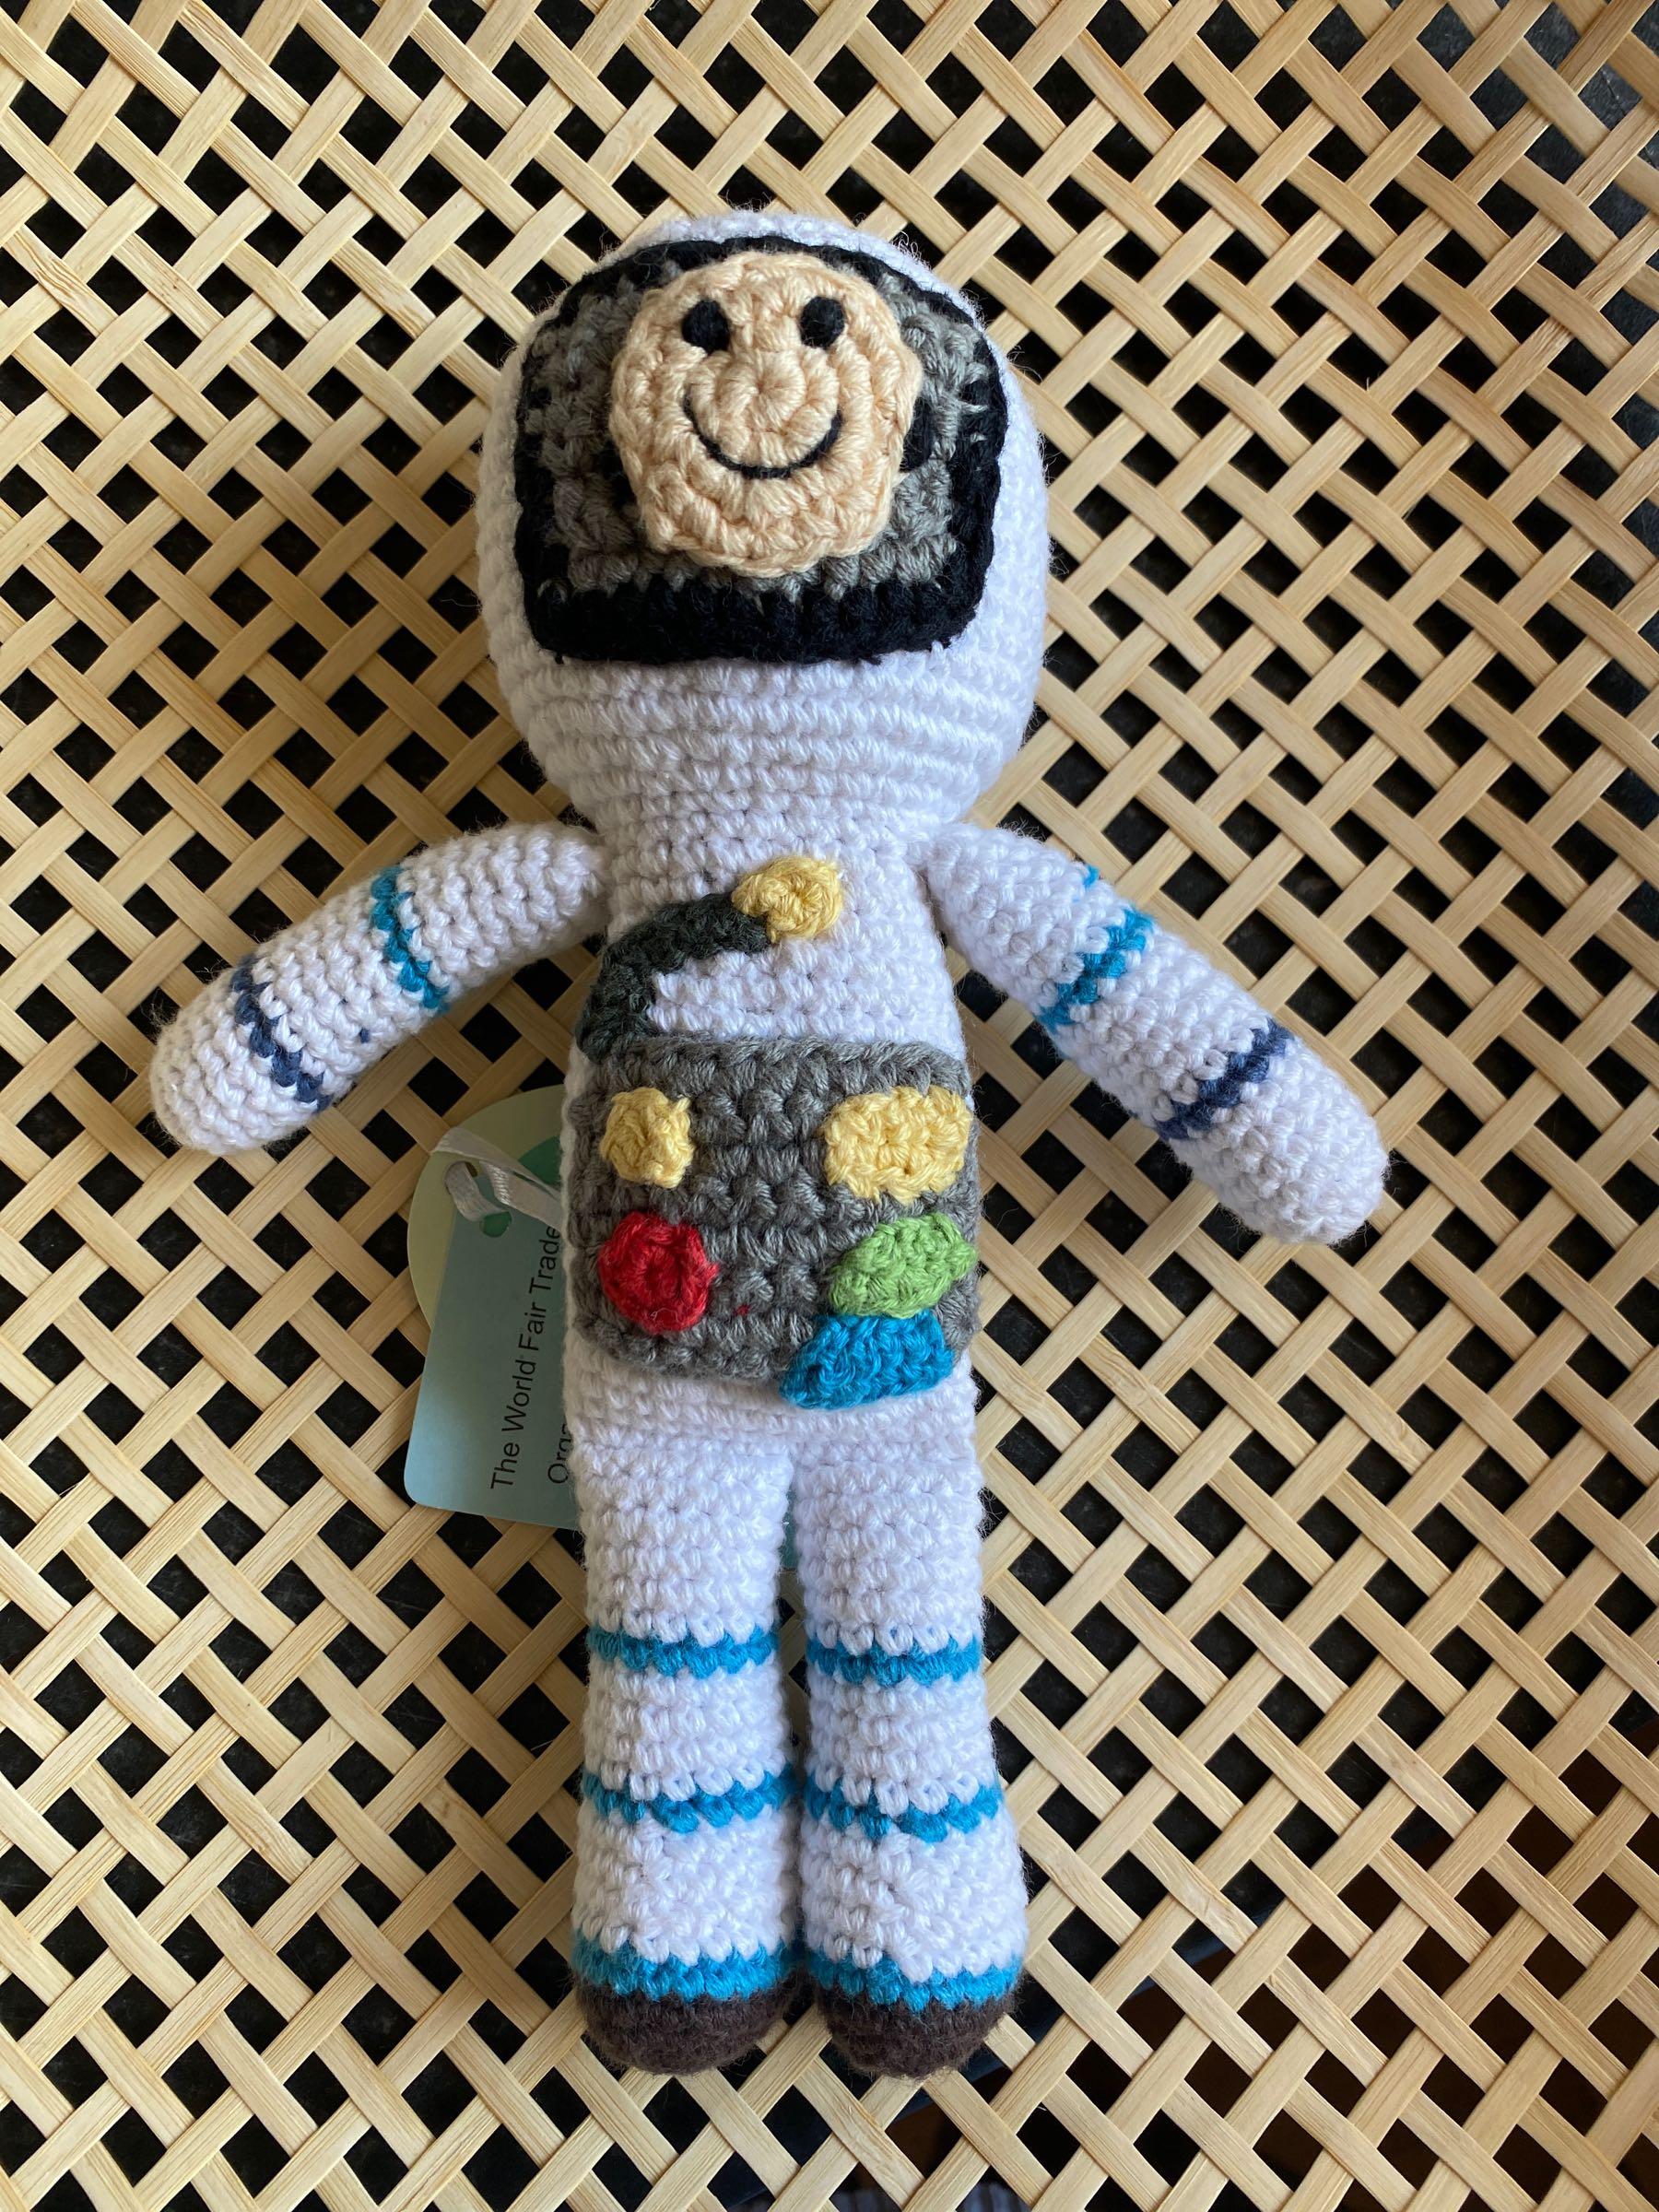 Pebble - Crochet spaceman rattle